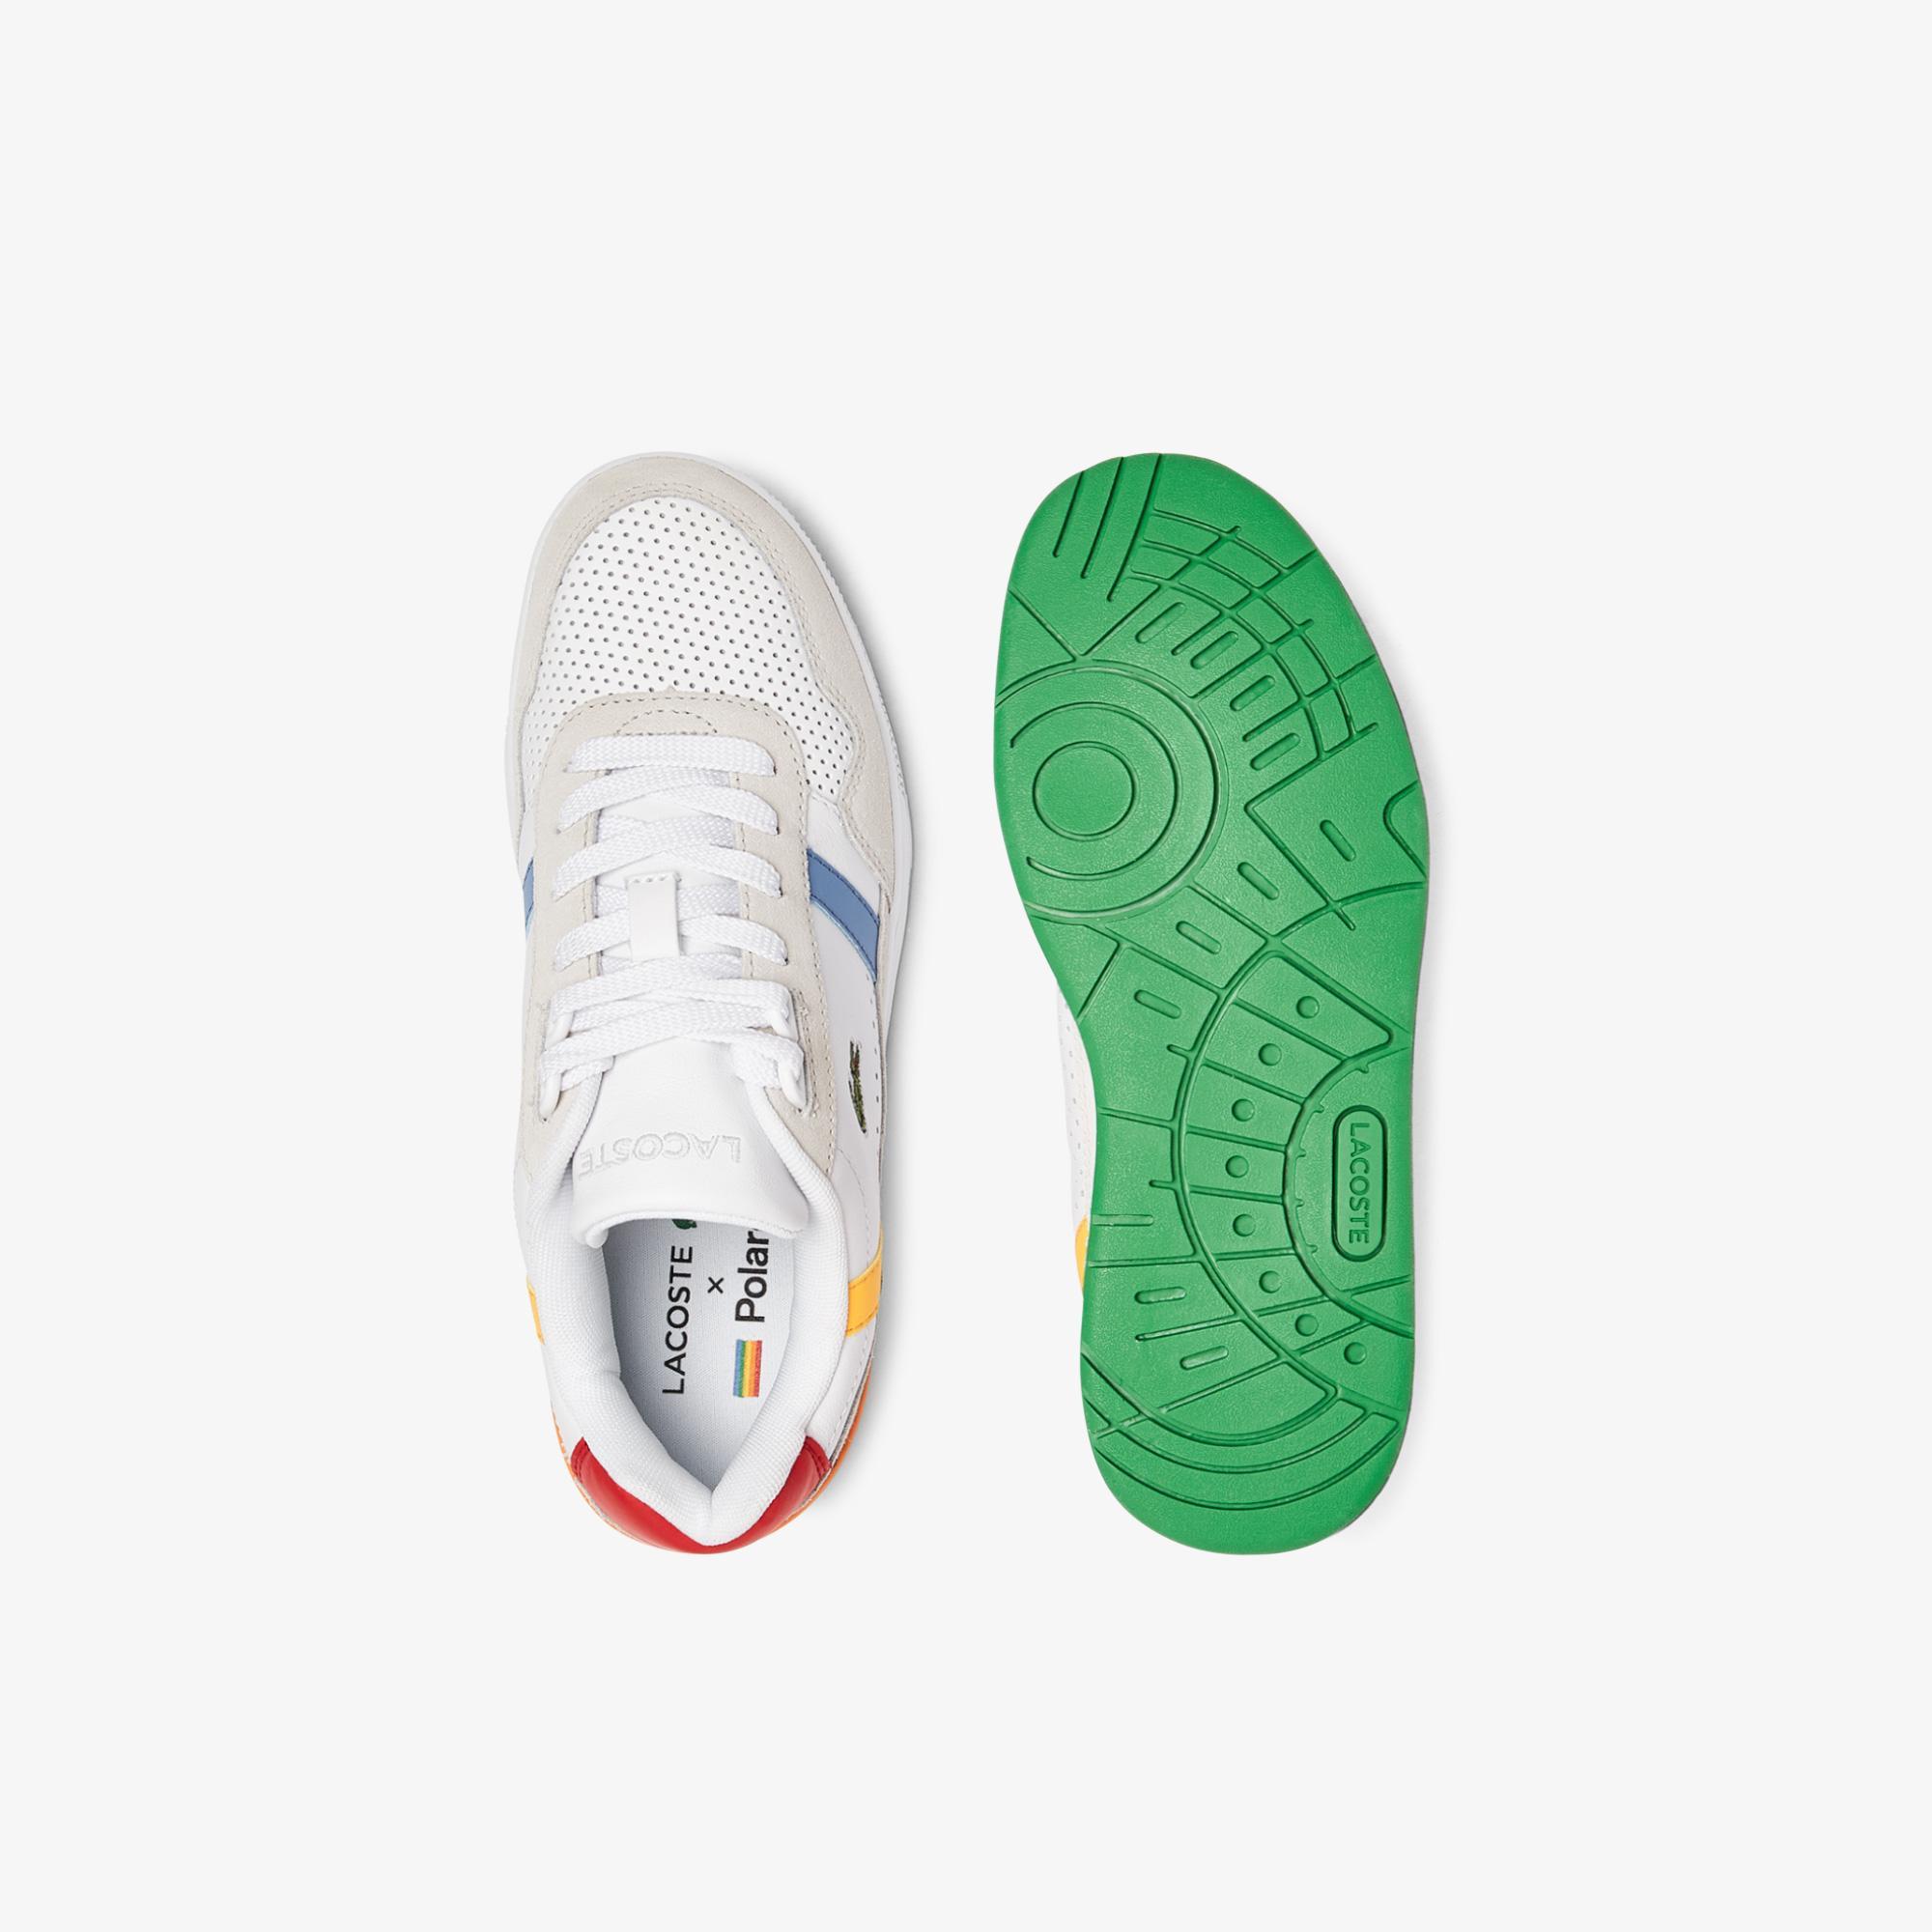 Lacoste кросівки чоловічі T-Clip x Polaroid